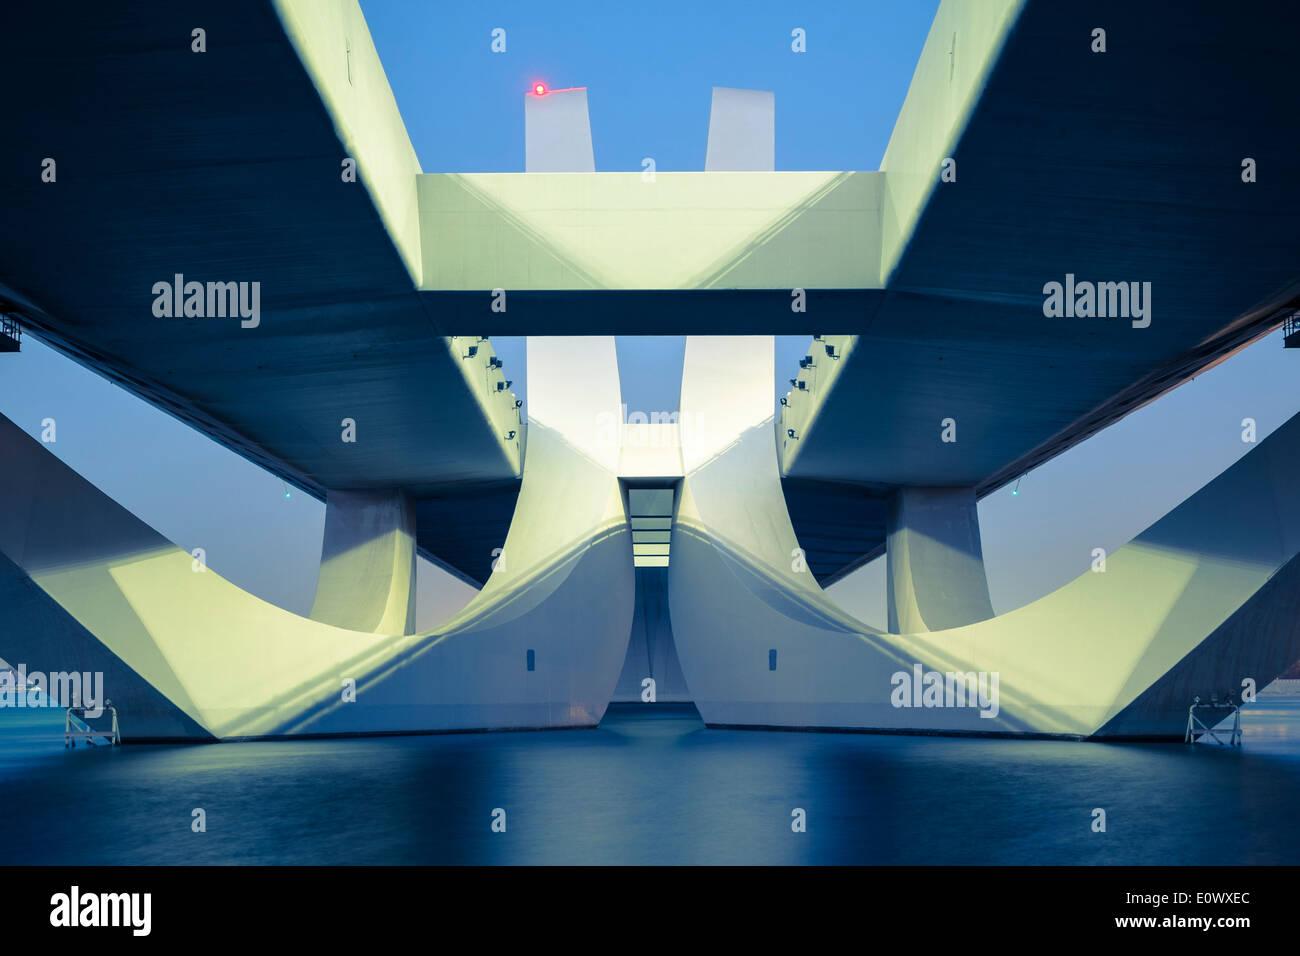 Modern Sheikh Zayed Bridge designed by Zaha Hadid in Abu Dhabi United Arab Emirates Stock Photo